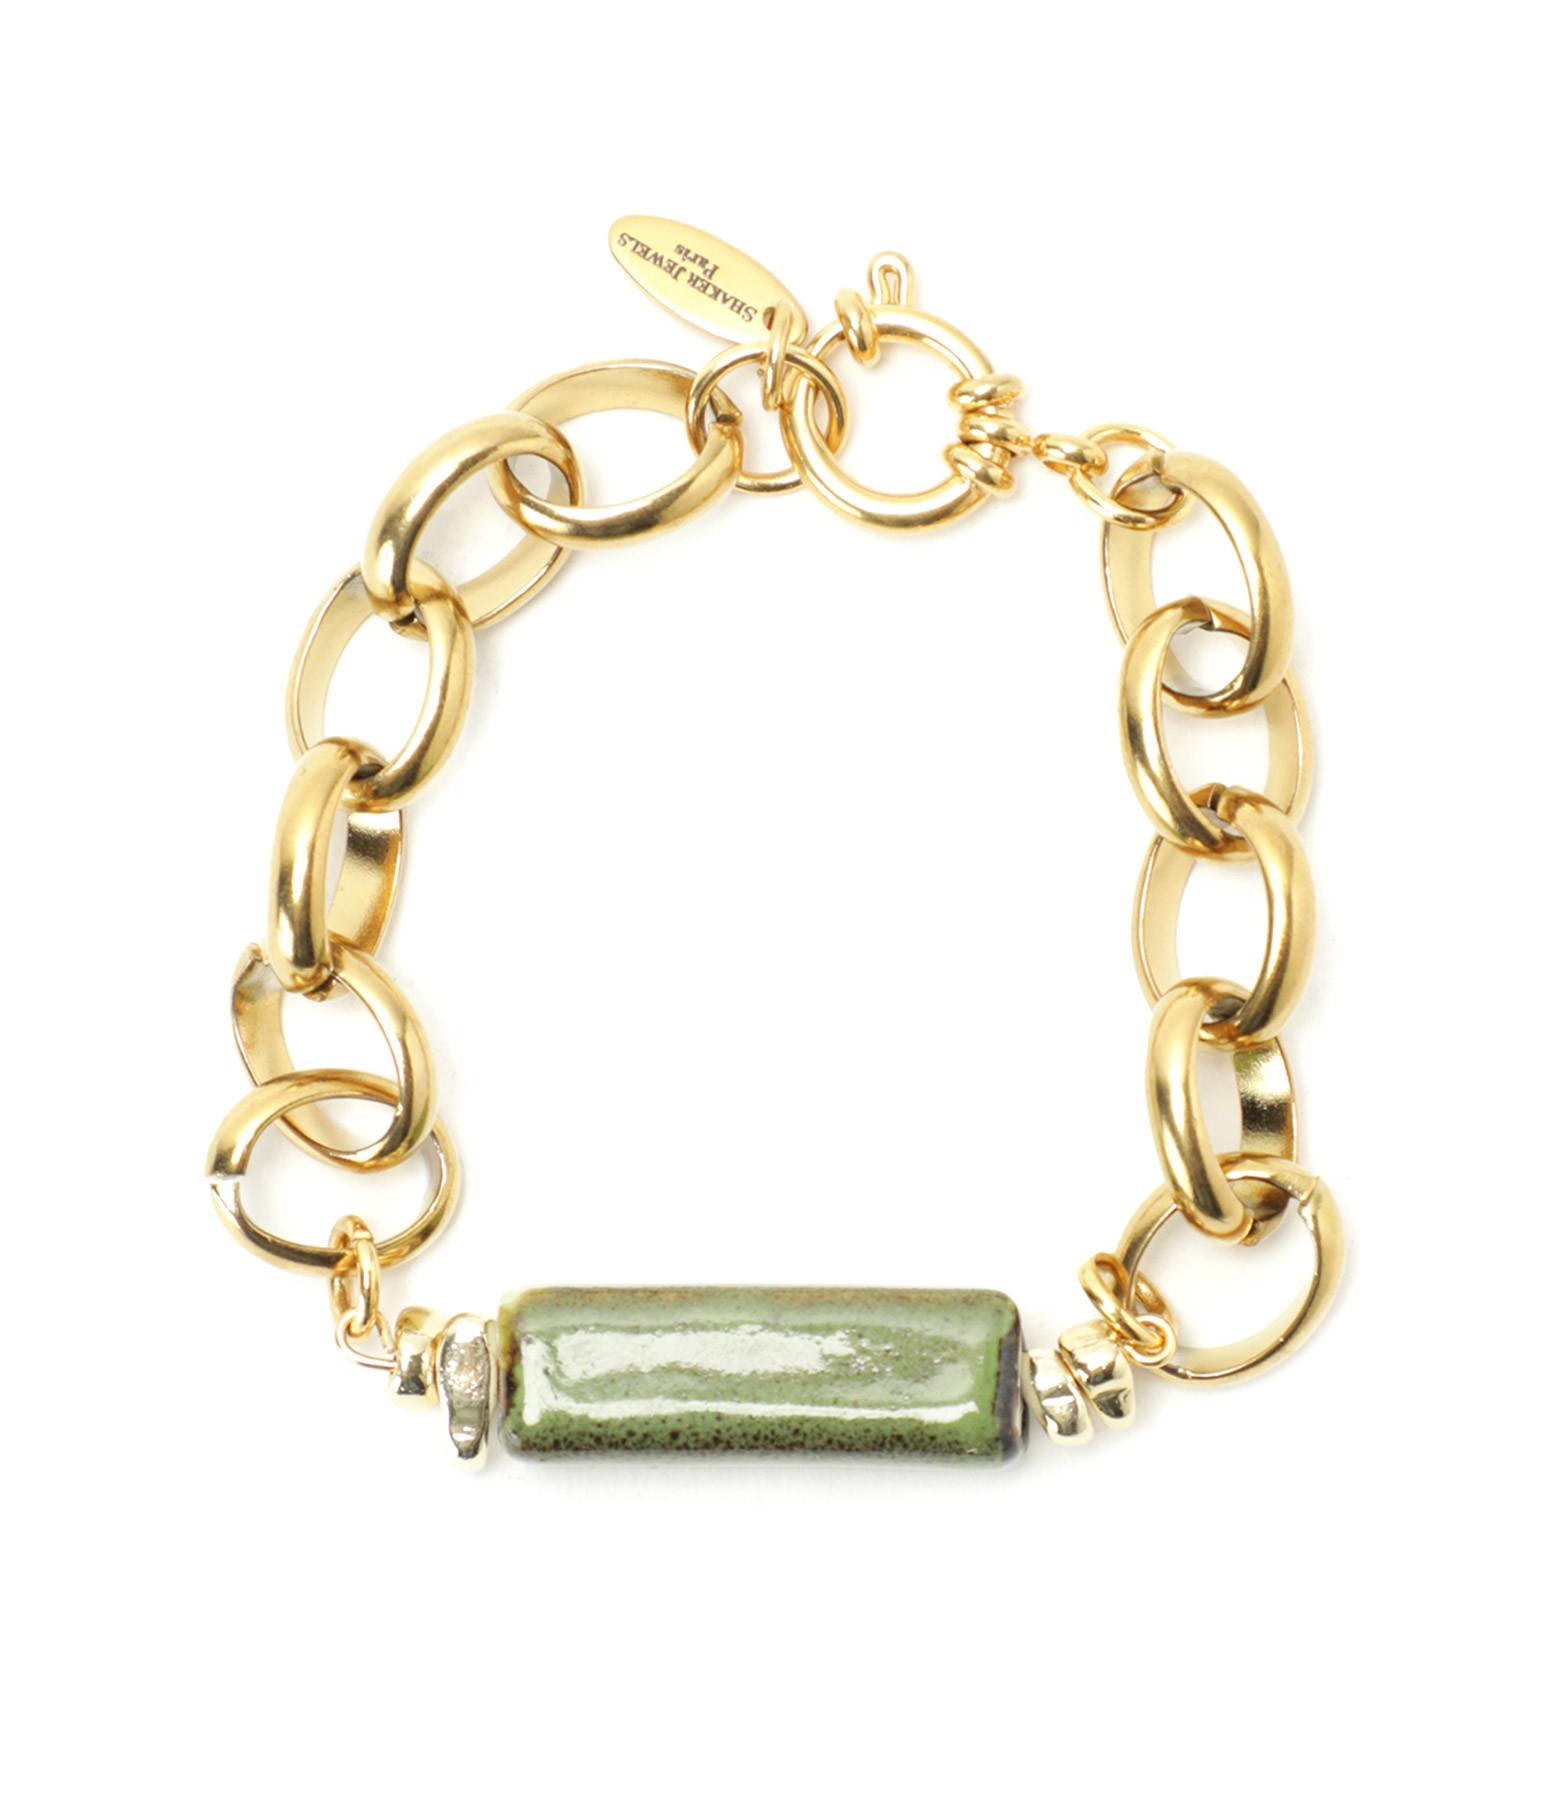 SHAKER JEWELS - Bracelet Laya Pierre Maille Plaqué Or